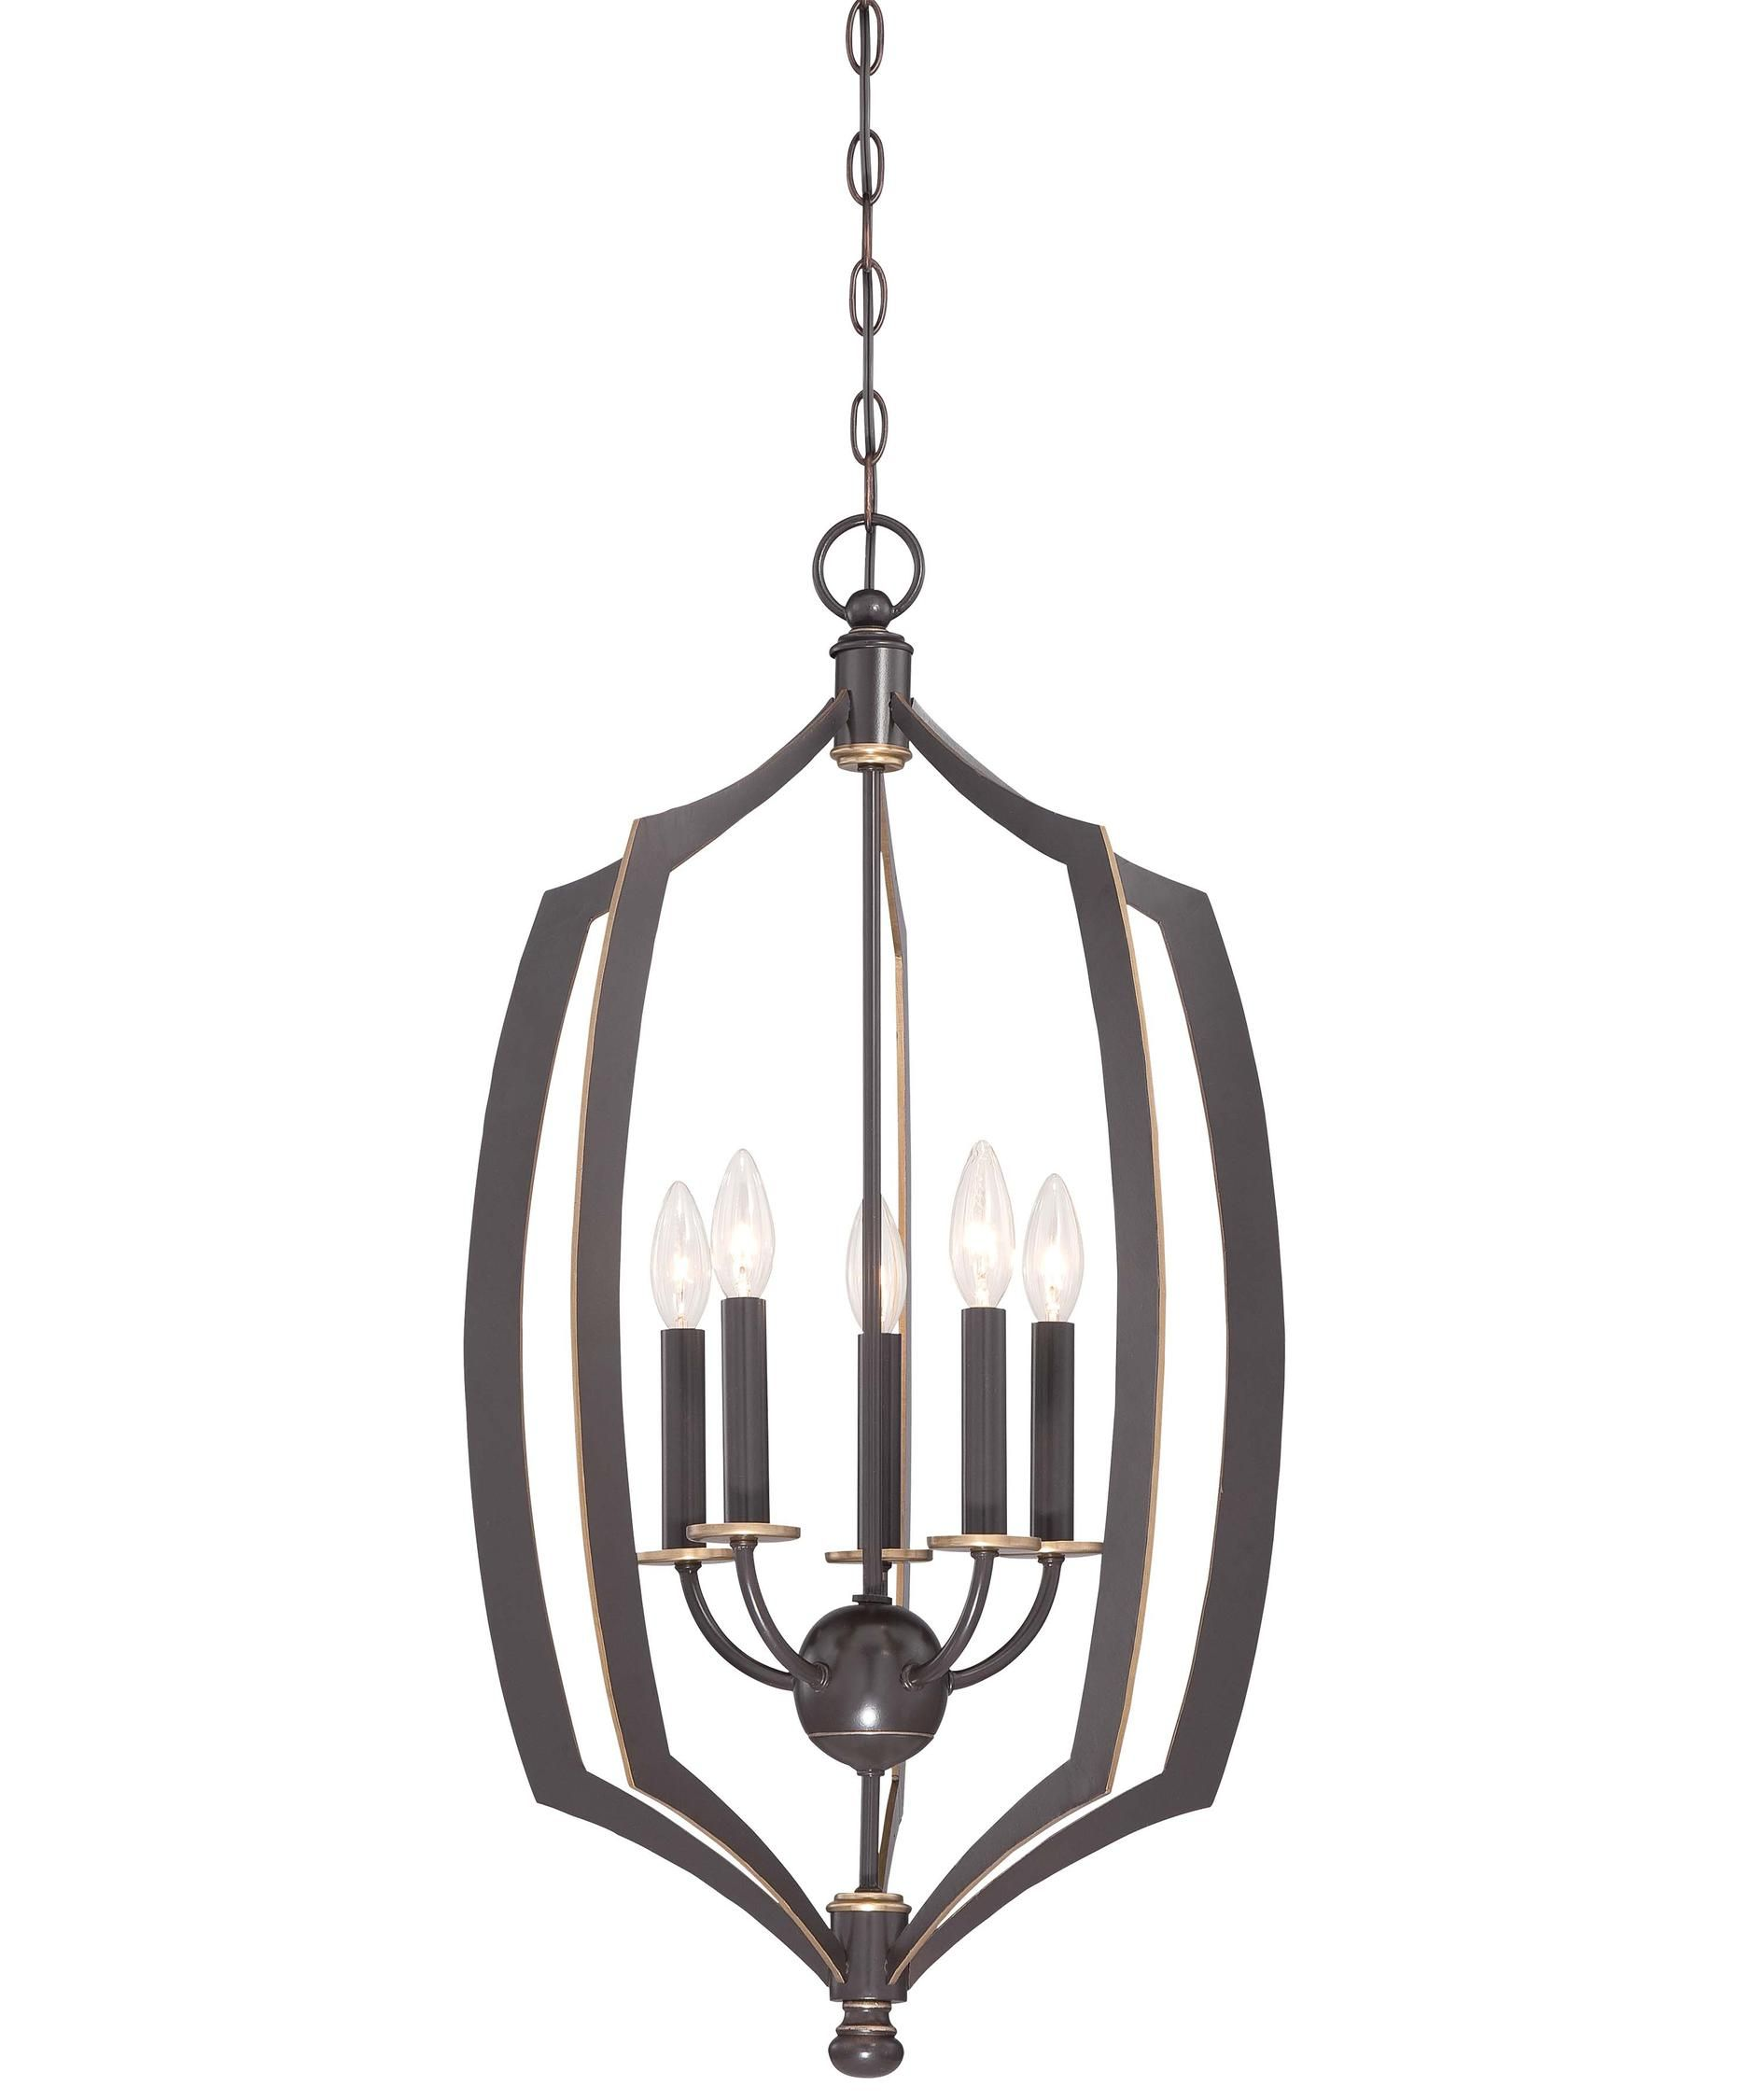 white foyer pendant lighting candle. Lights White Foyer Pendant Lighting Candle